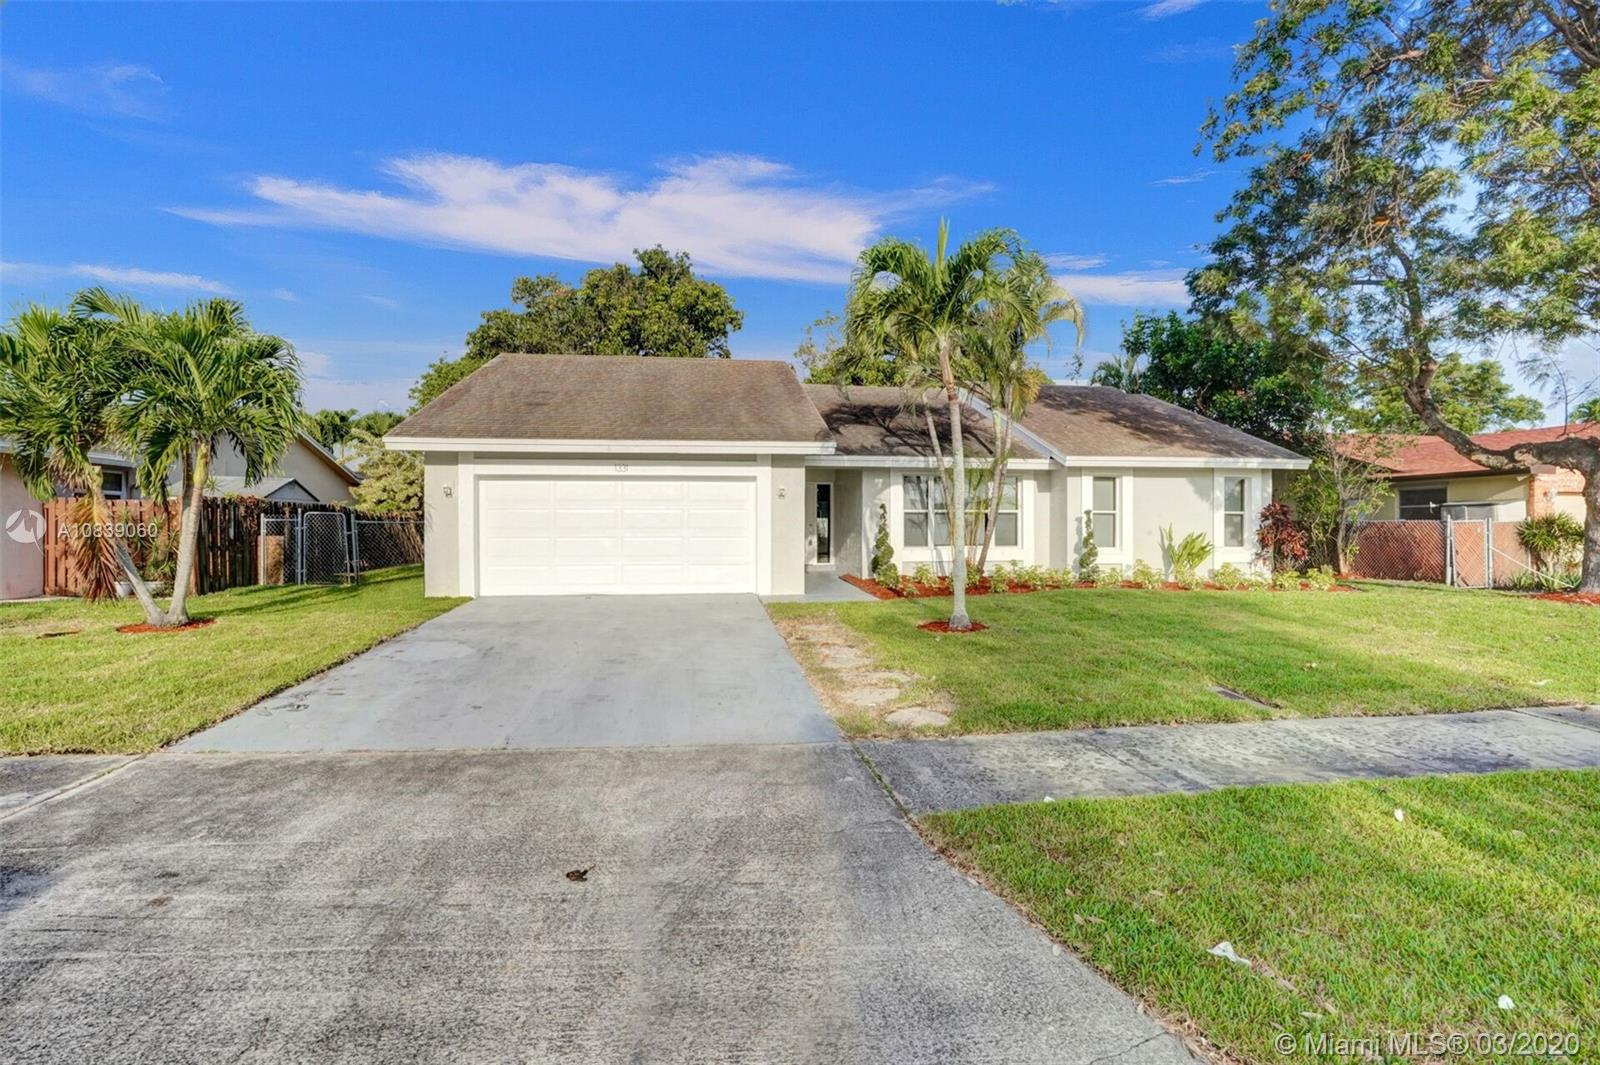 1331 SW 27th Ave, Deerfield Beach, FL 33442